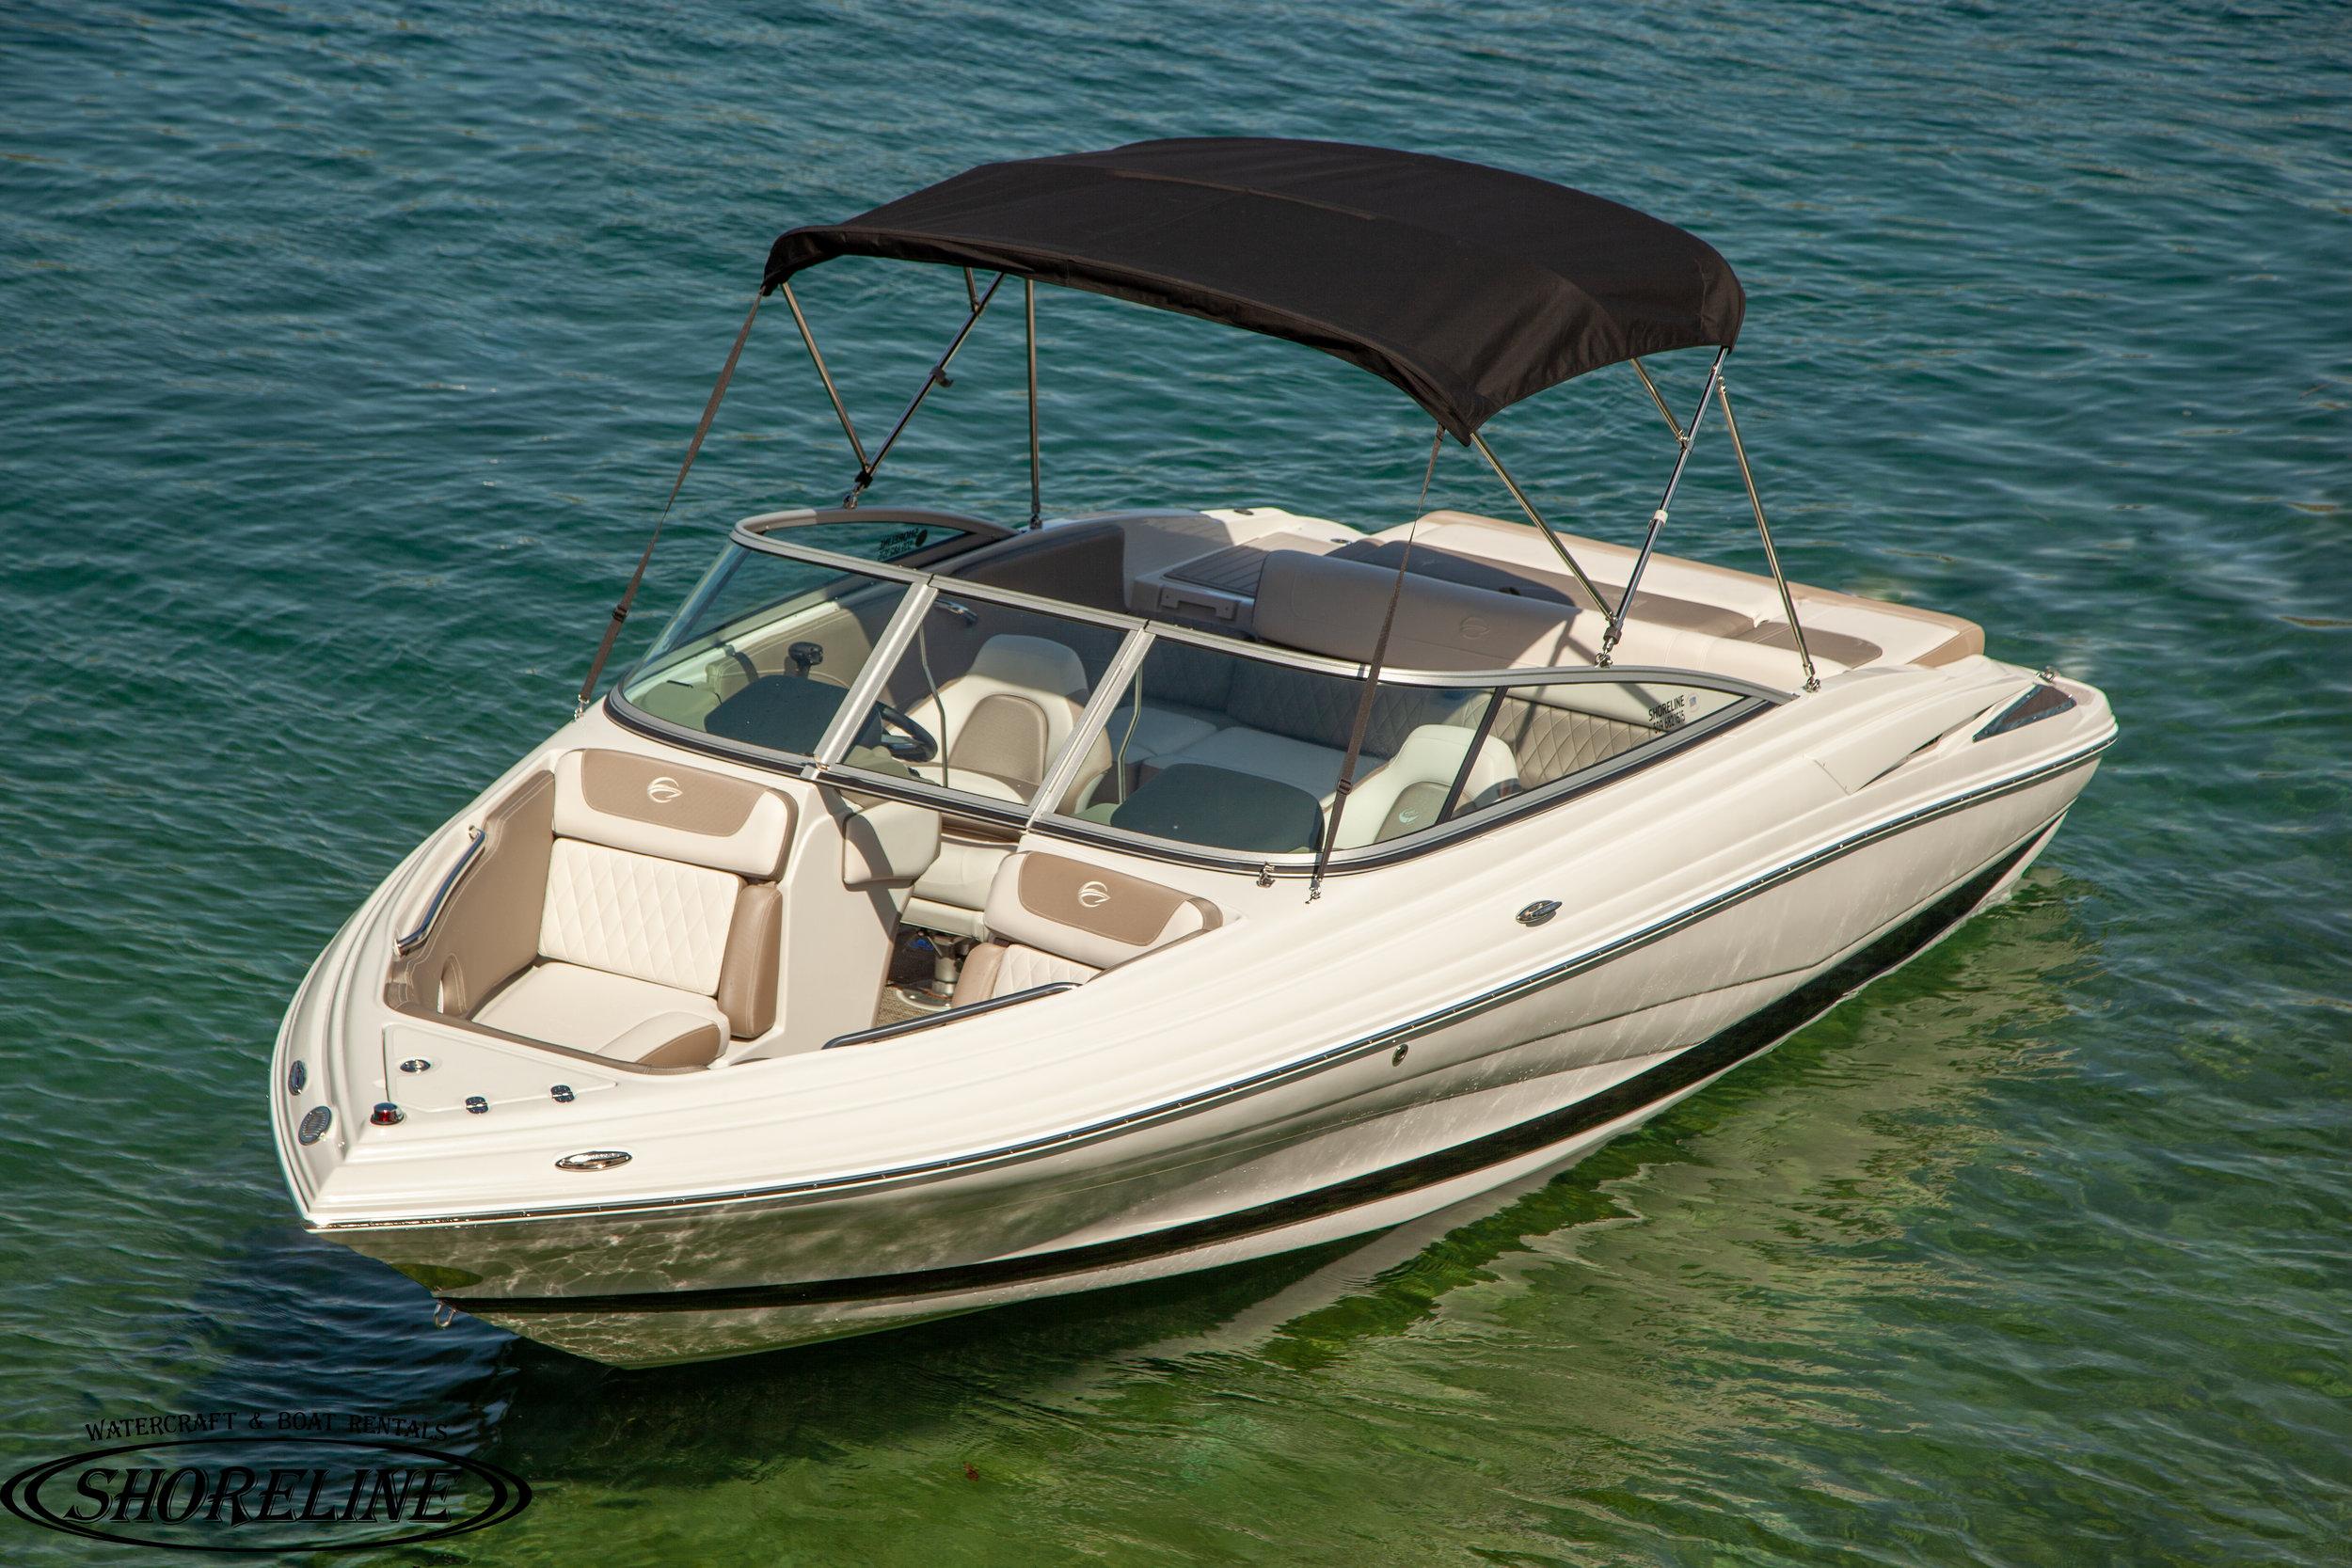 Crownline 215 Rental Boat — Shoreline Watercraft